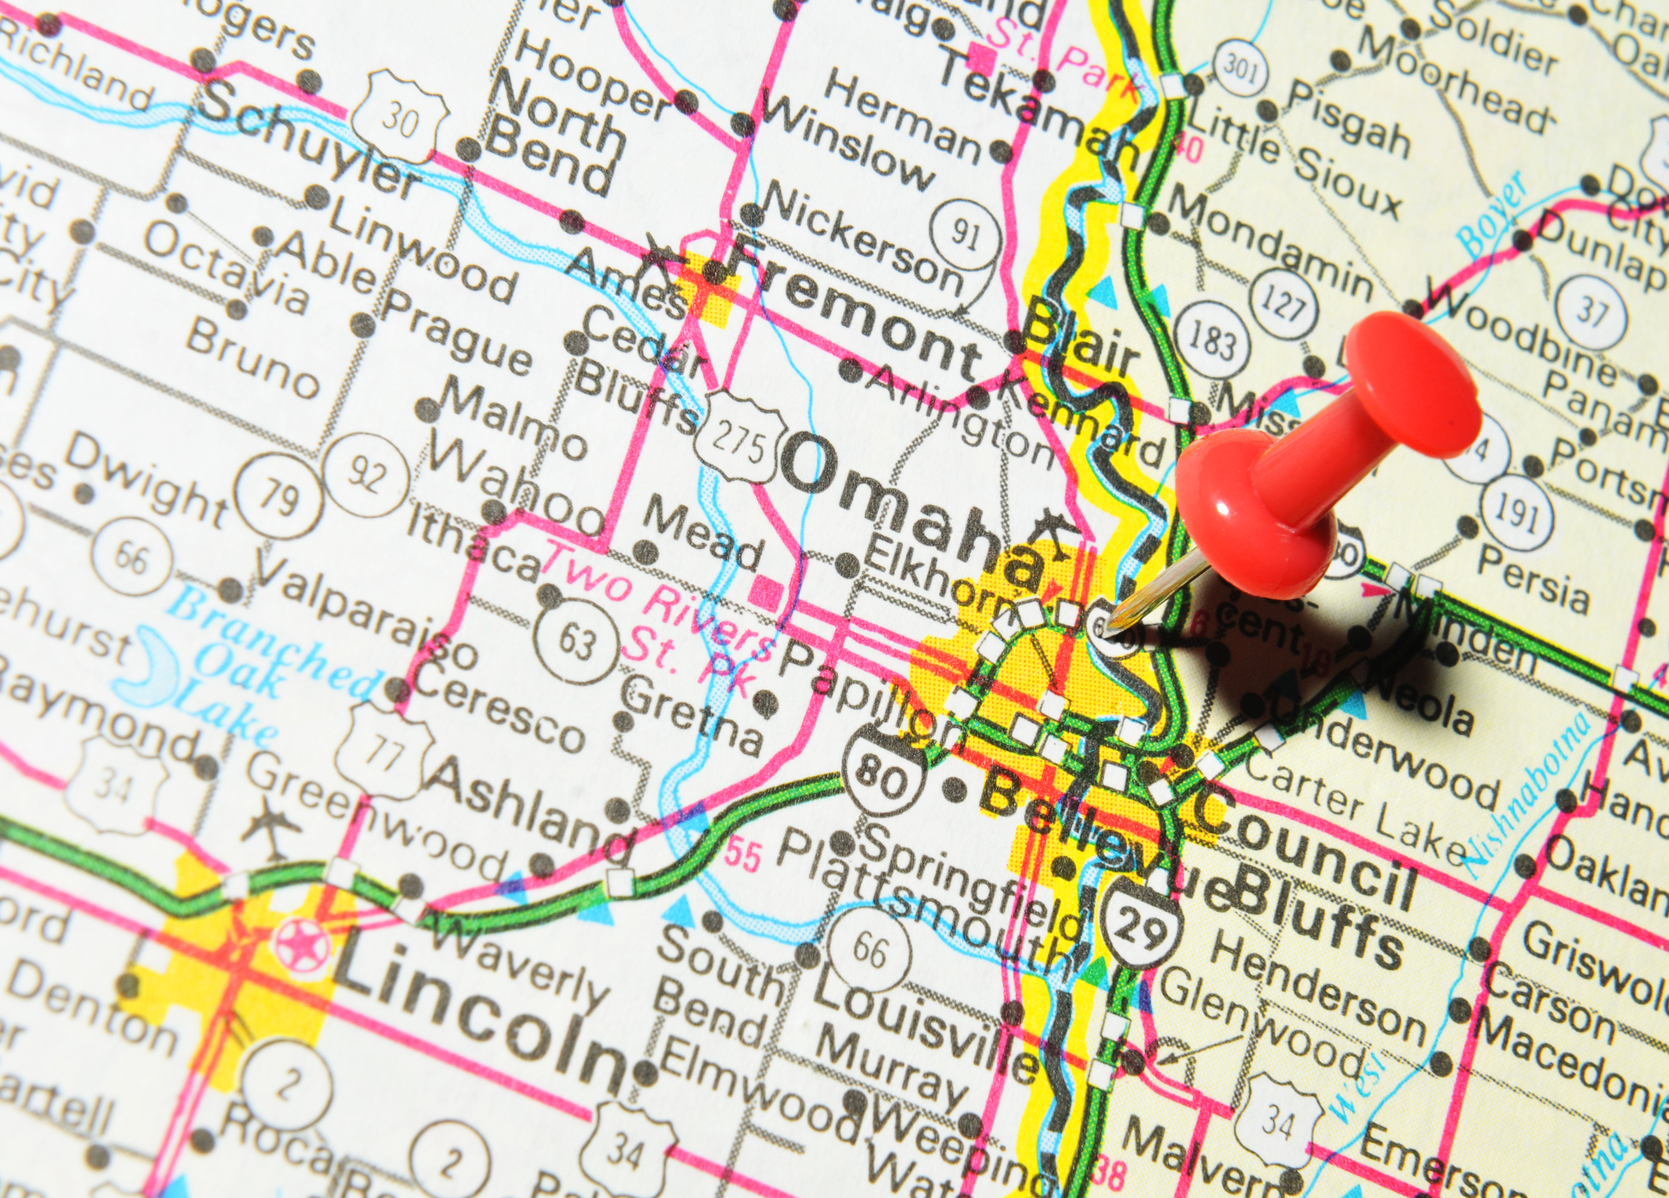 city-omaha-map-digital-marketing-neb